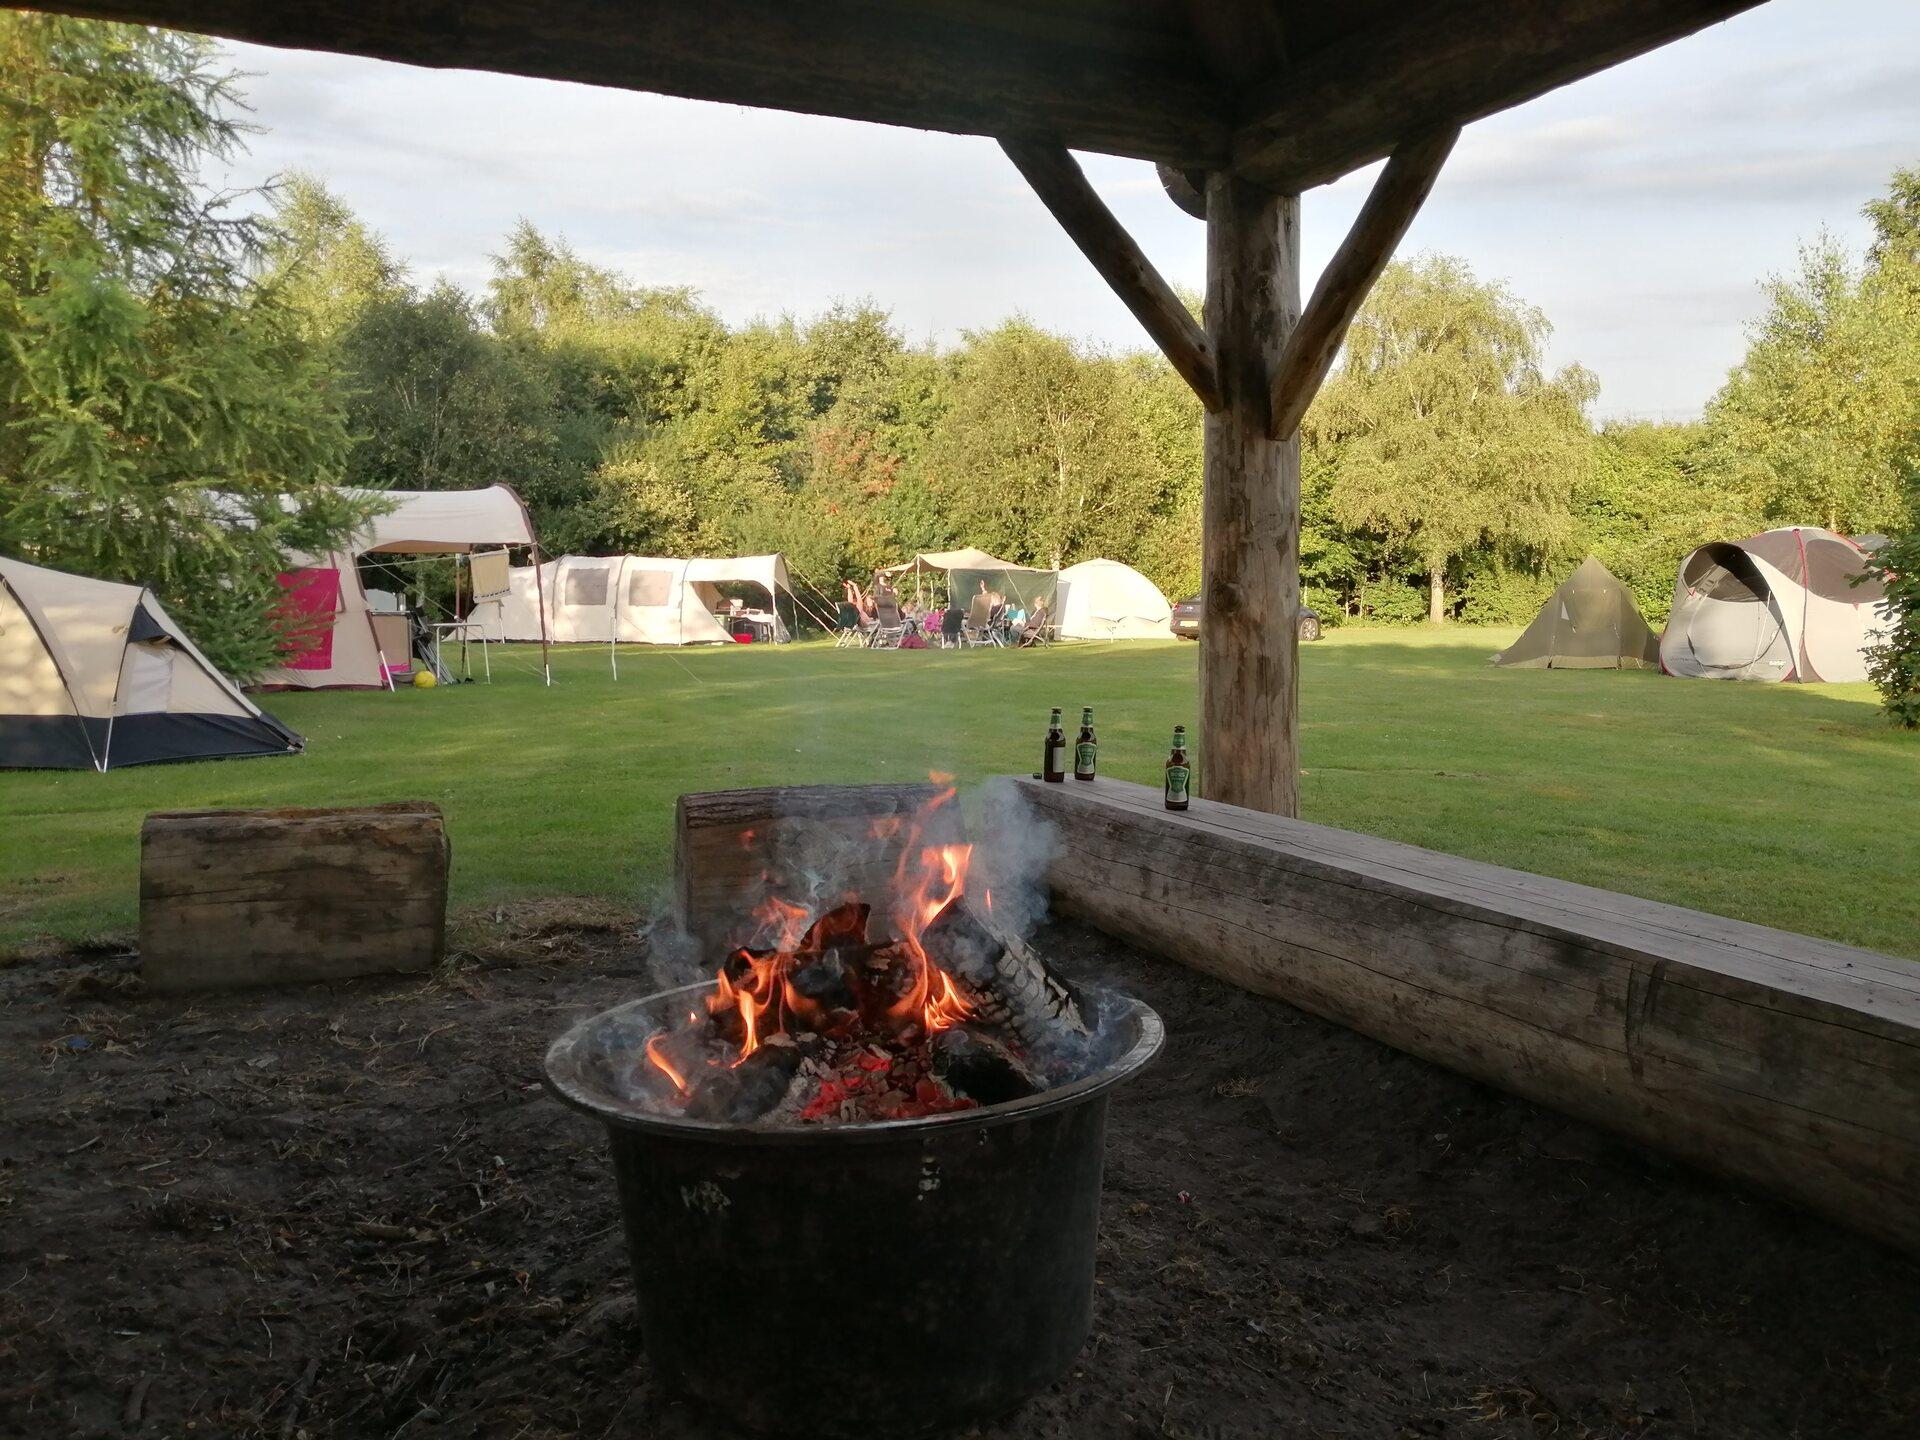 Overkapte kampvuurplaats